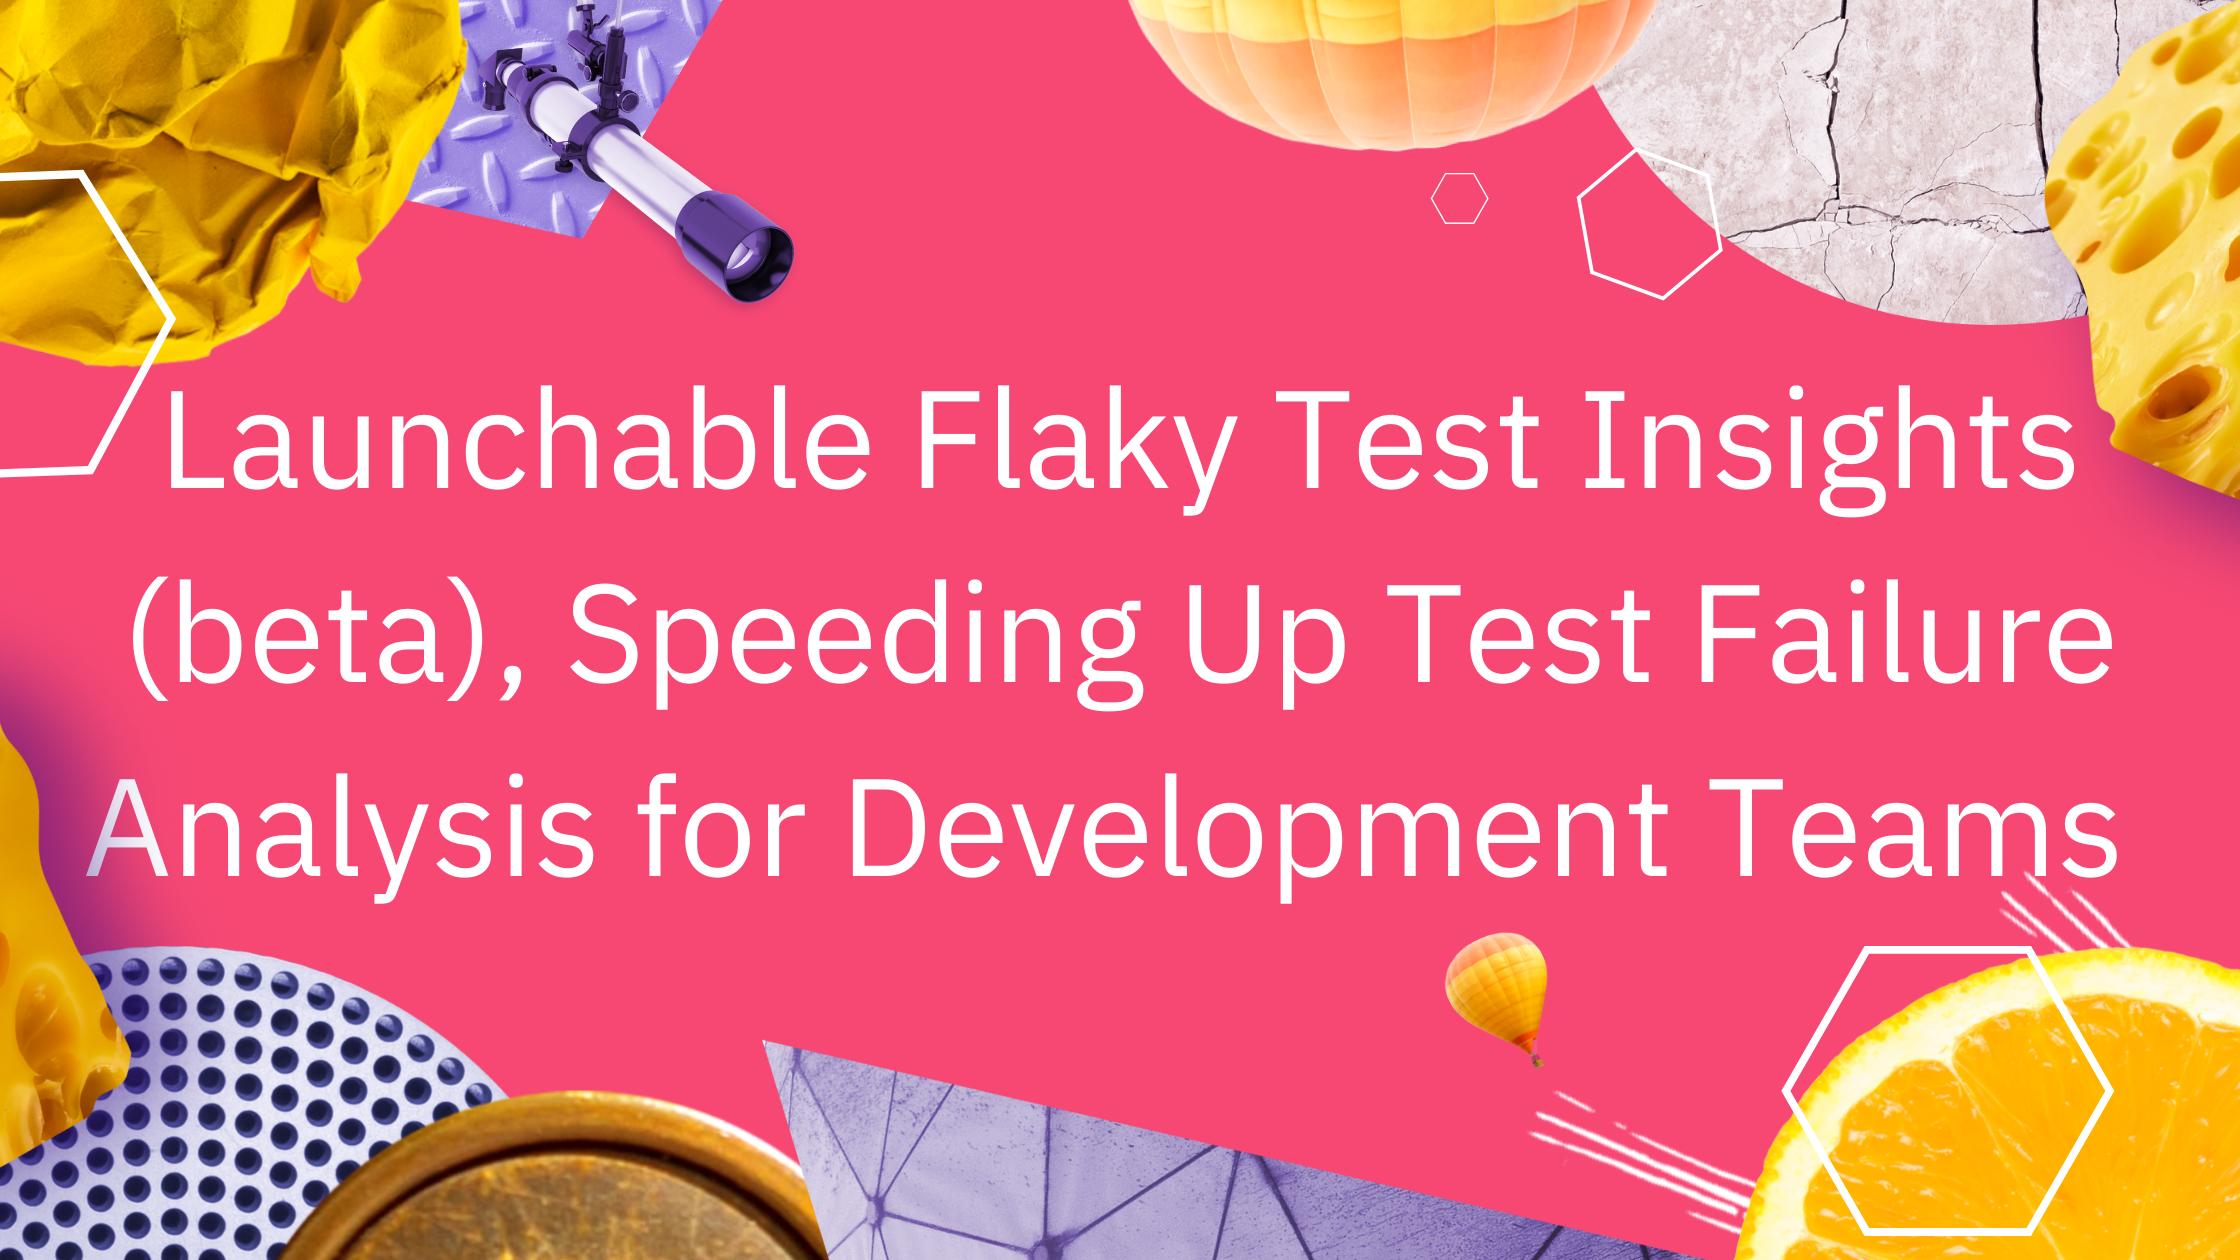 Launchable Flaky Test Insights (beta), Speeding Up Test Failure Analysis for Development Teams